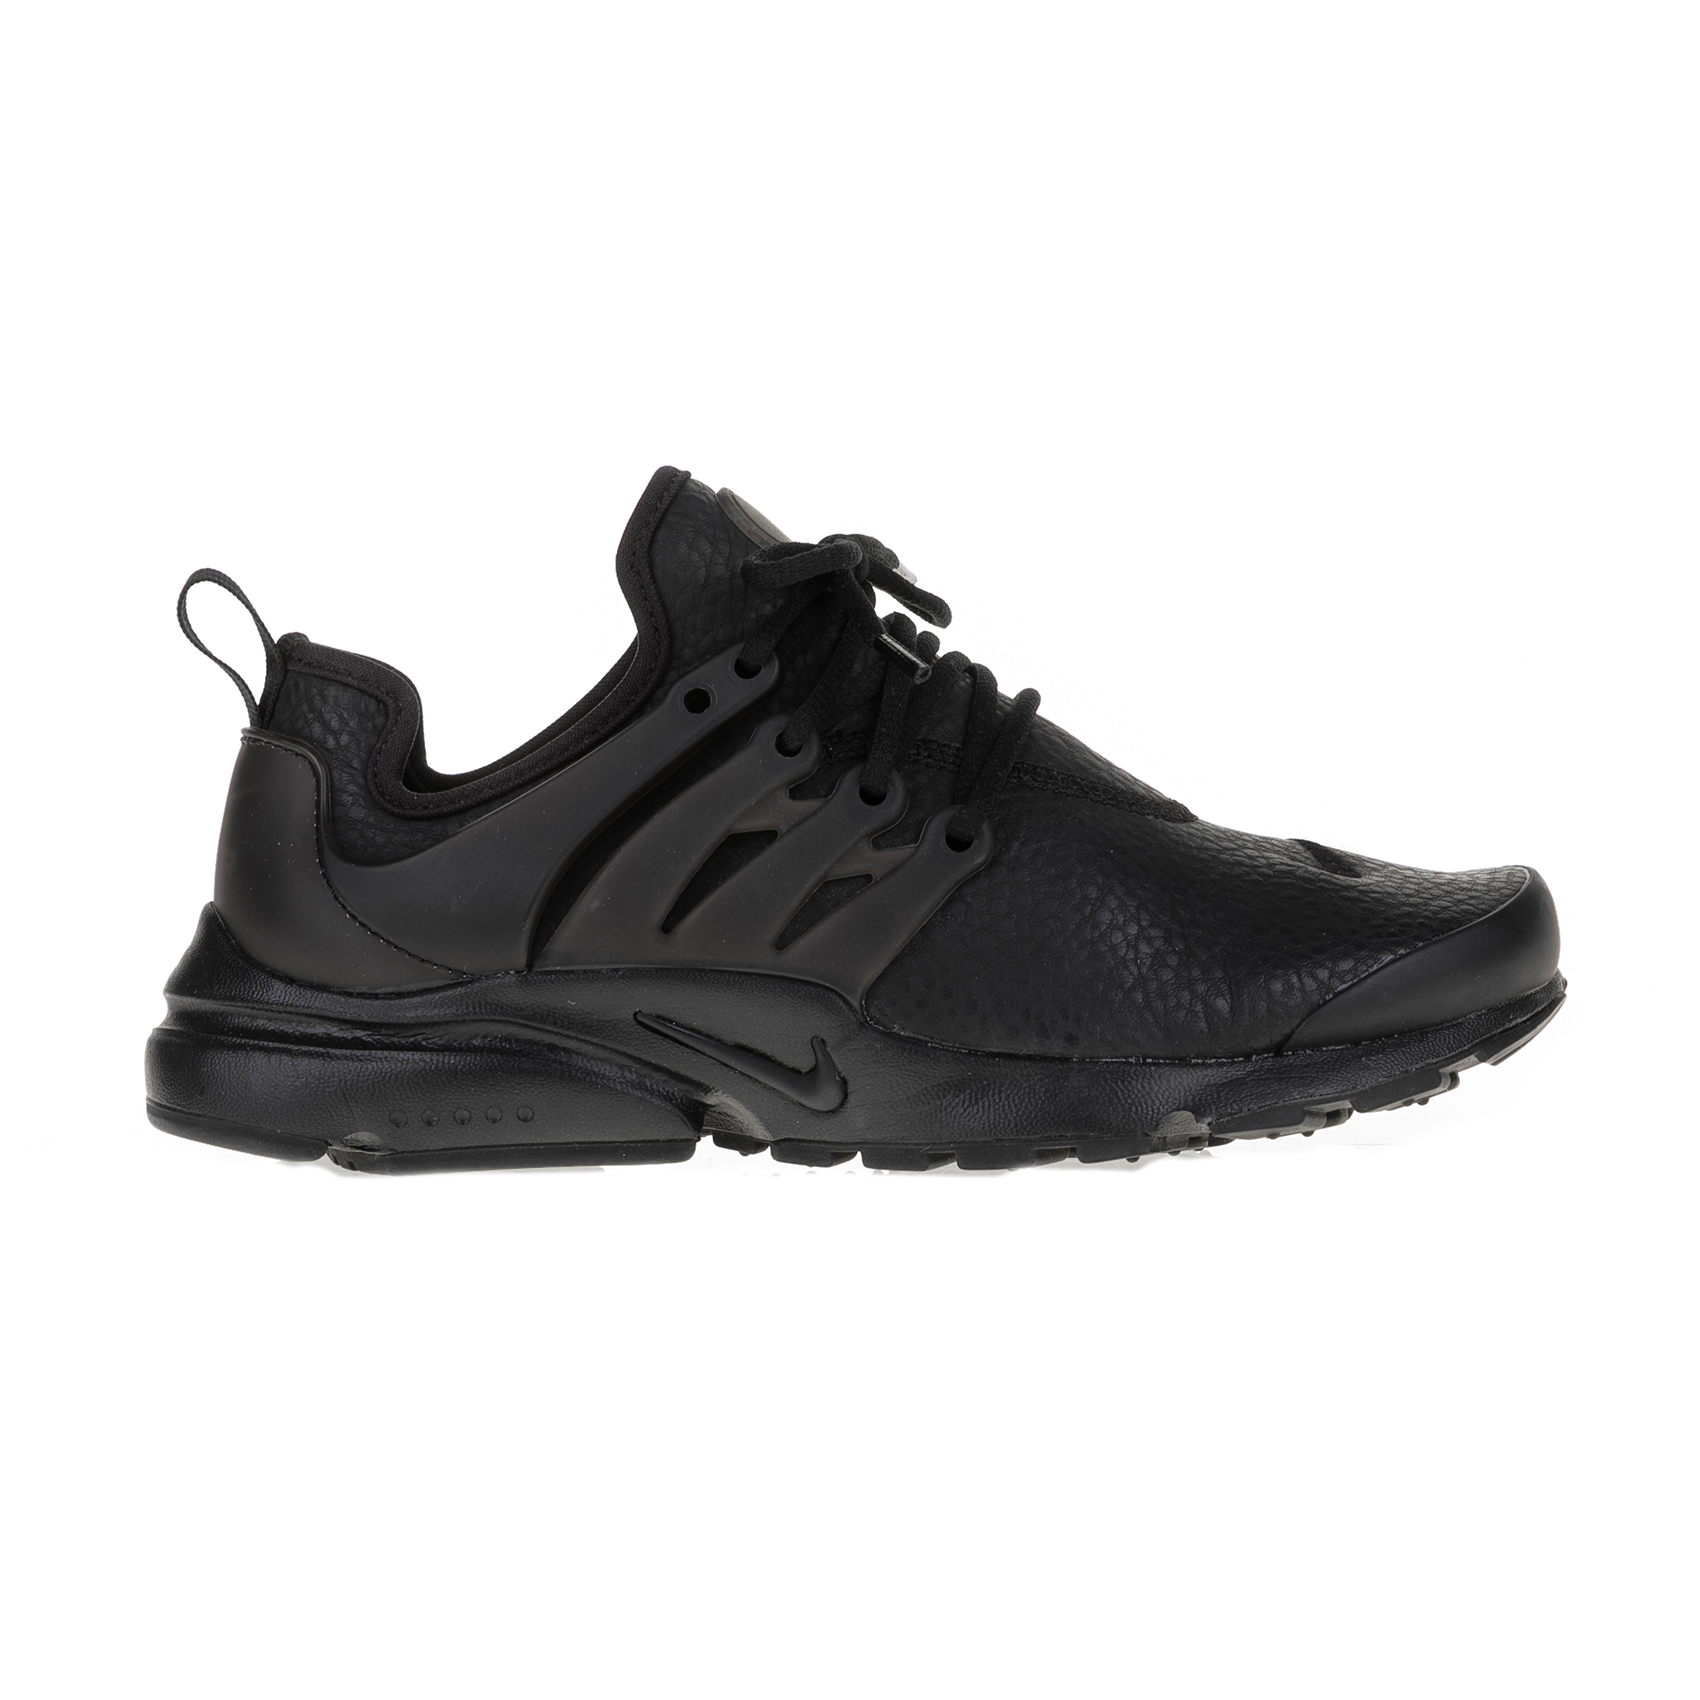 NIKE - Γυναικεία παπούτσια Nike AIR PRESTO PRM μάυρα γυναικεία παπούτσια αθλητικά running